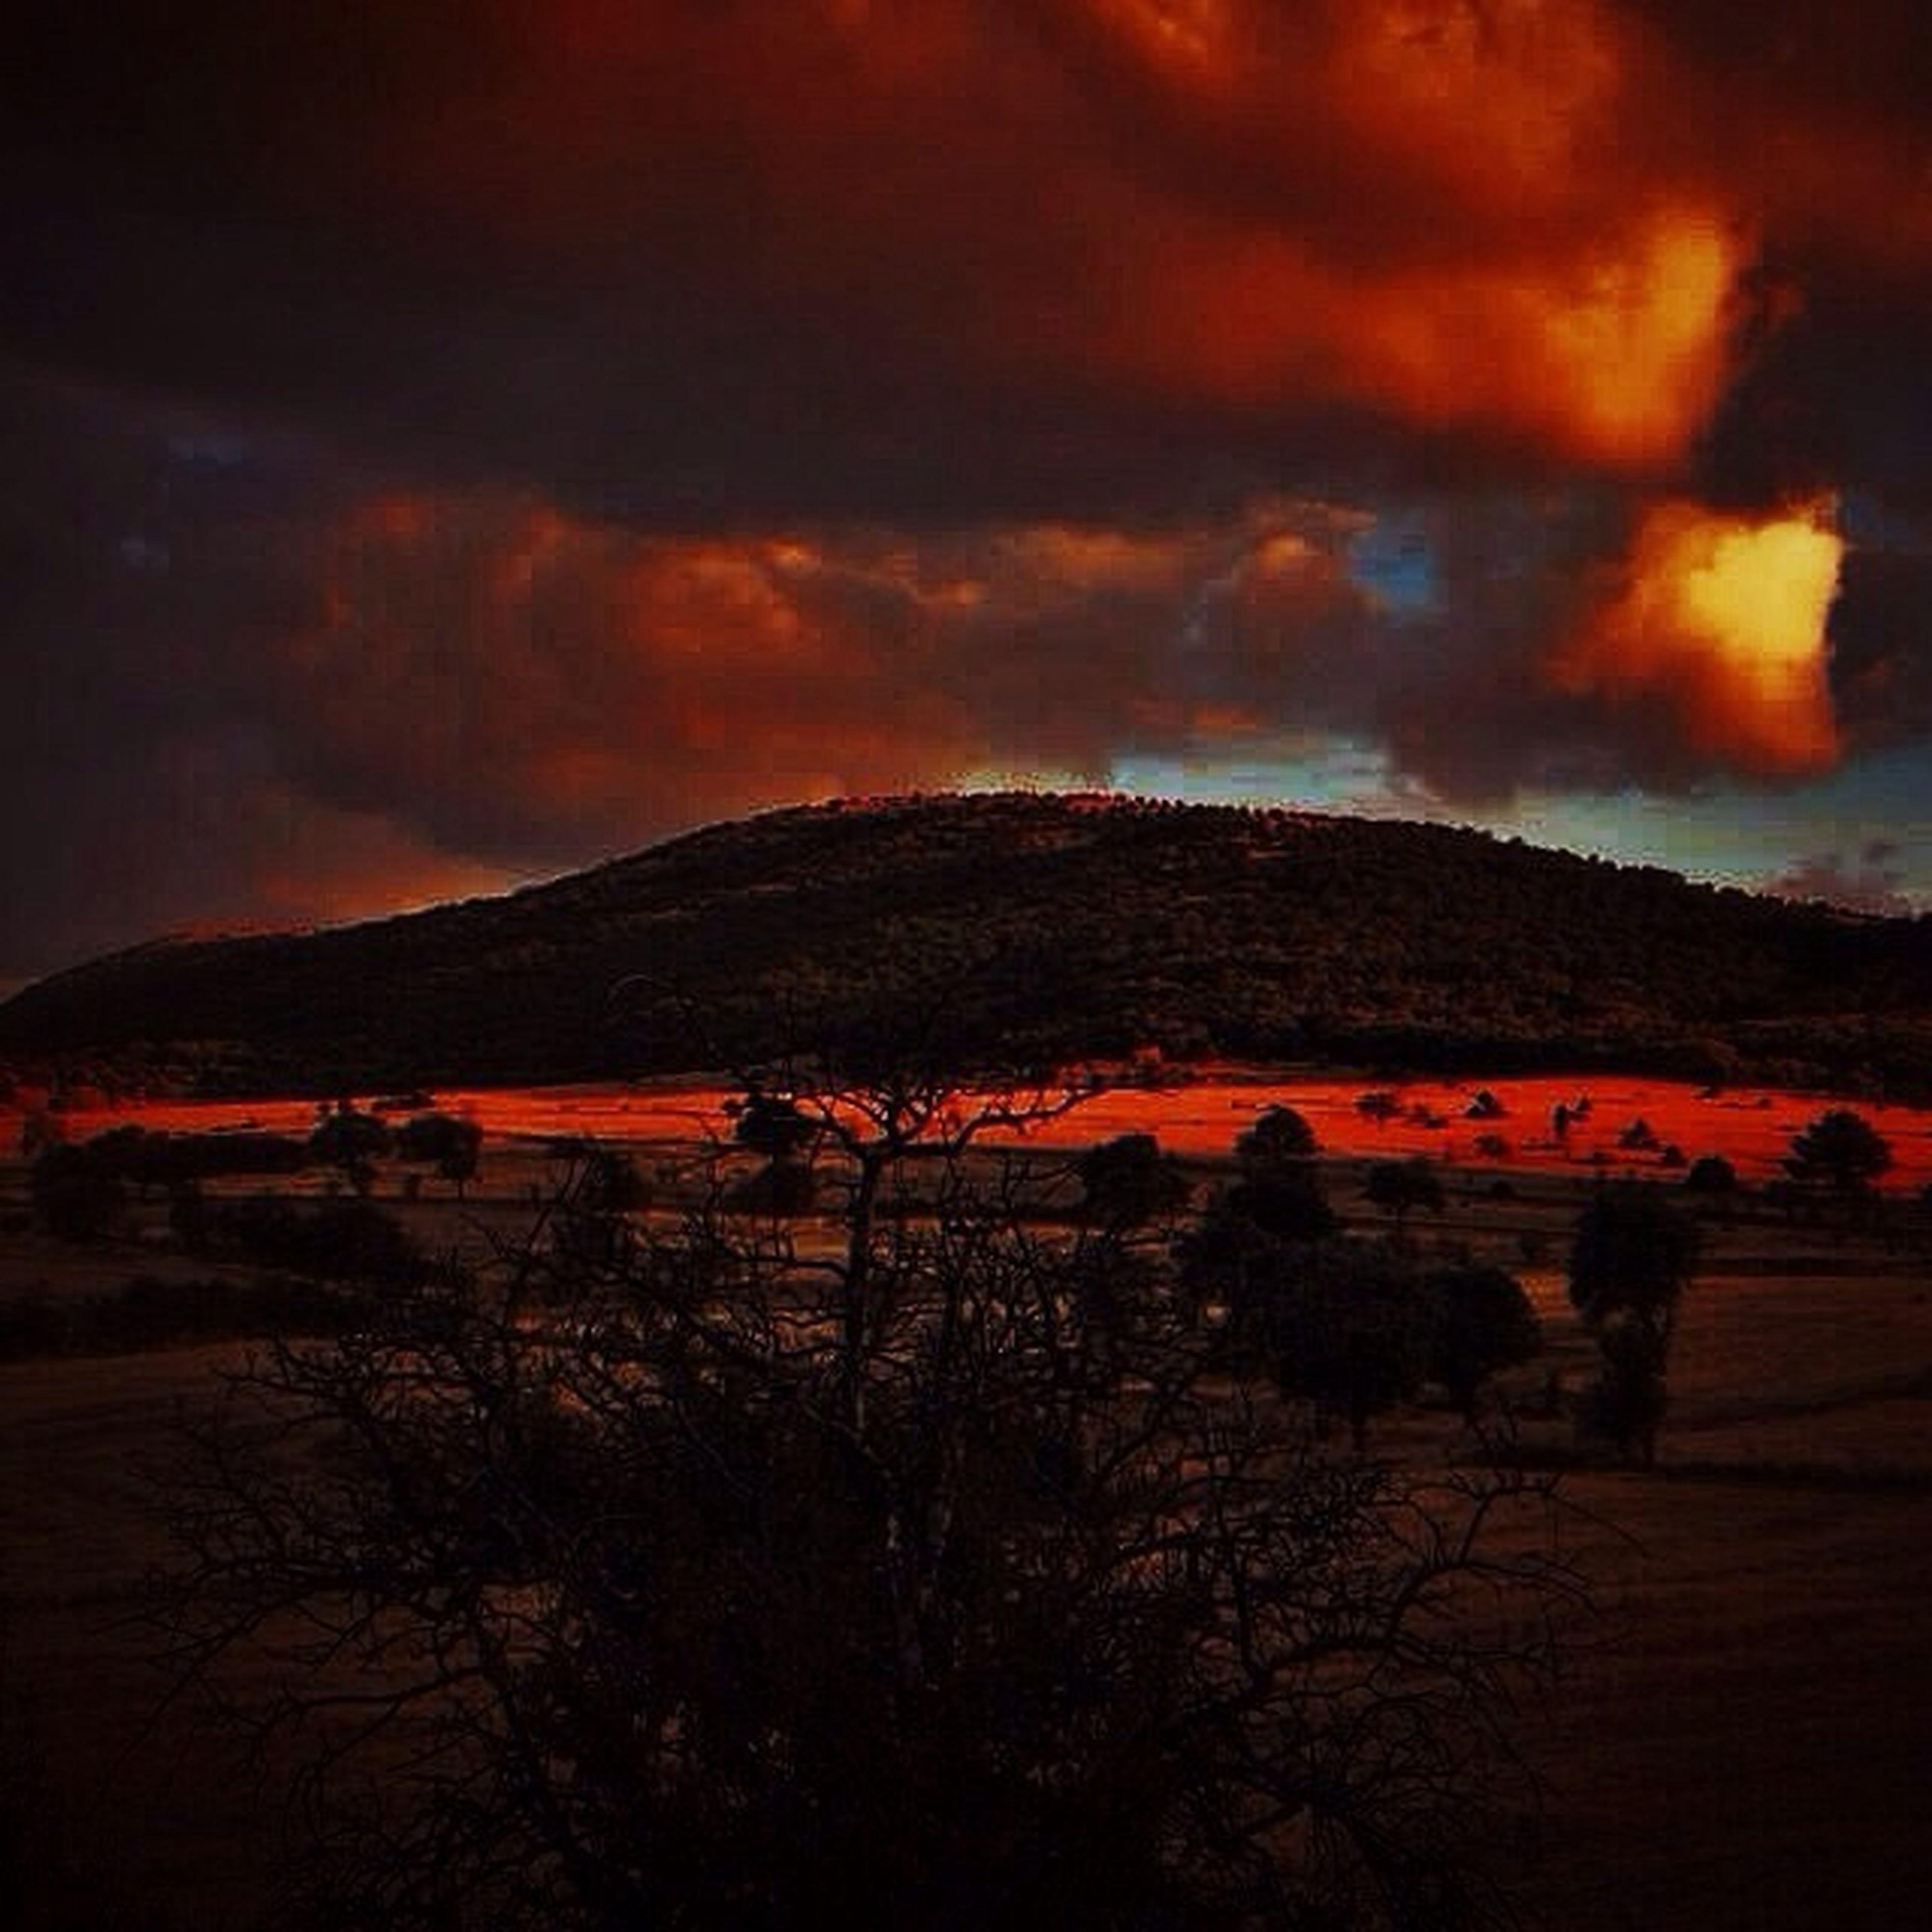 sunset, tranquil scene, sky, scenics, landscape, tranquility, beauty in nature, cloud - sky, nature, orange color, field, idyllic, dramatic sky, mountain, tree, cloud, silhouette, cloudy, non-urban scene, dusk